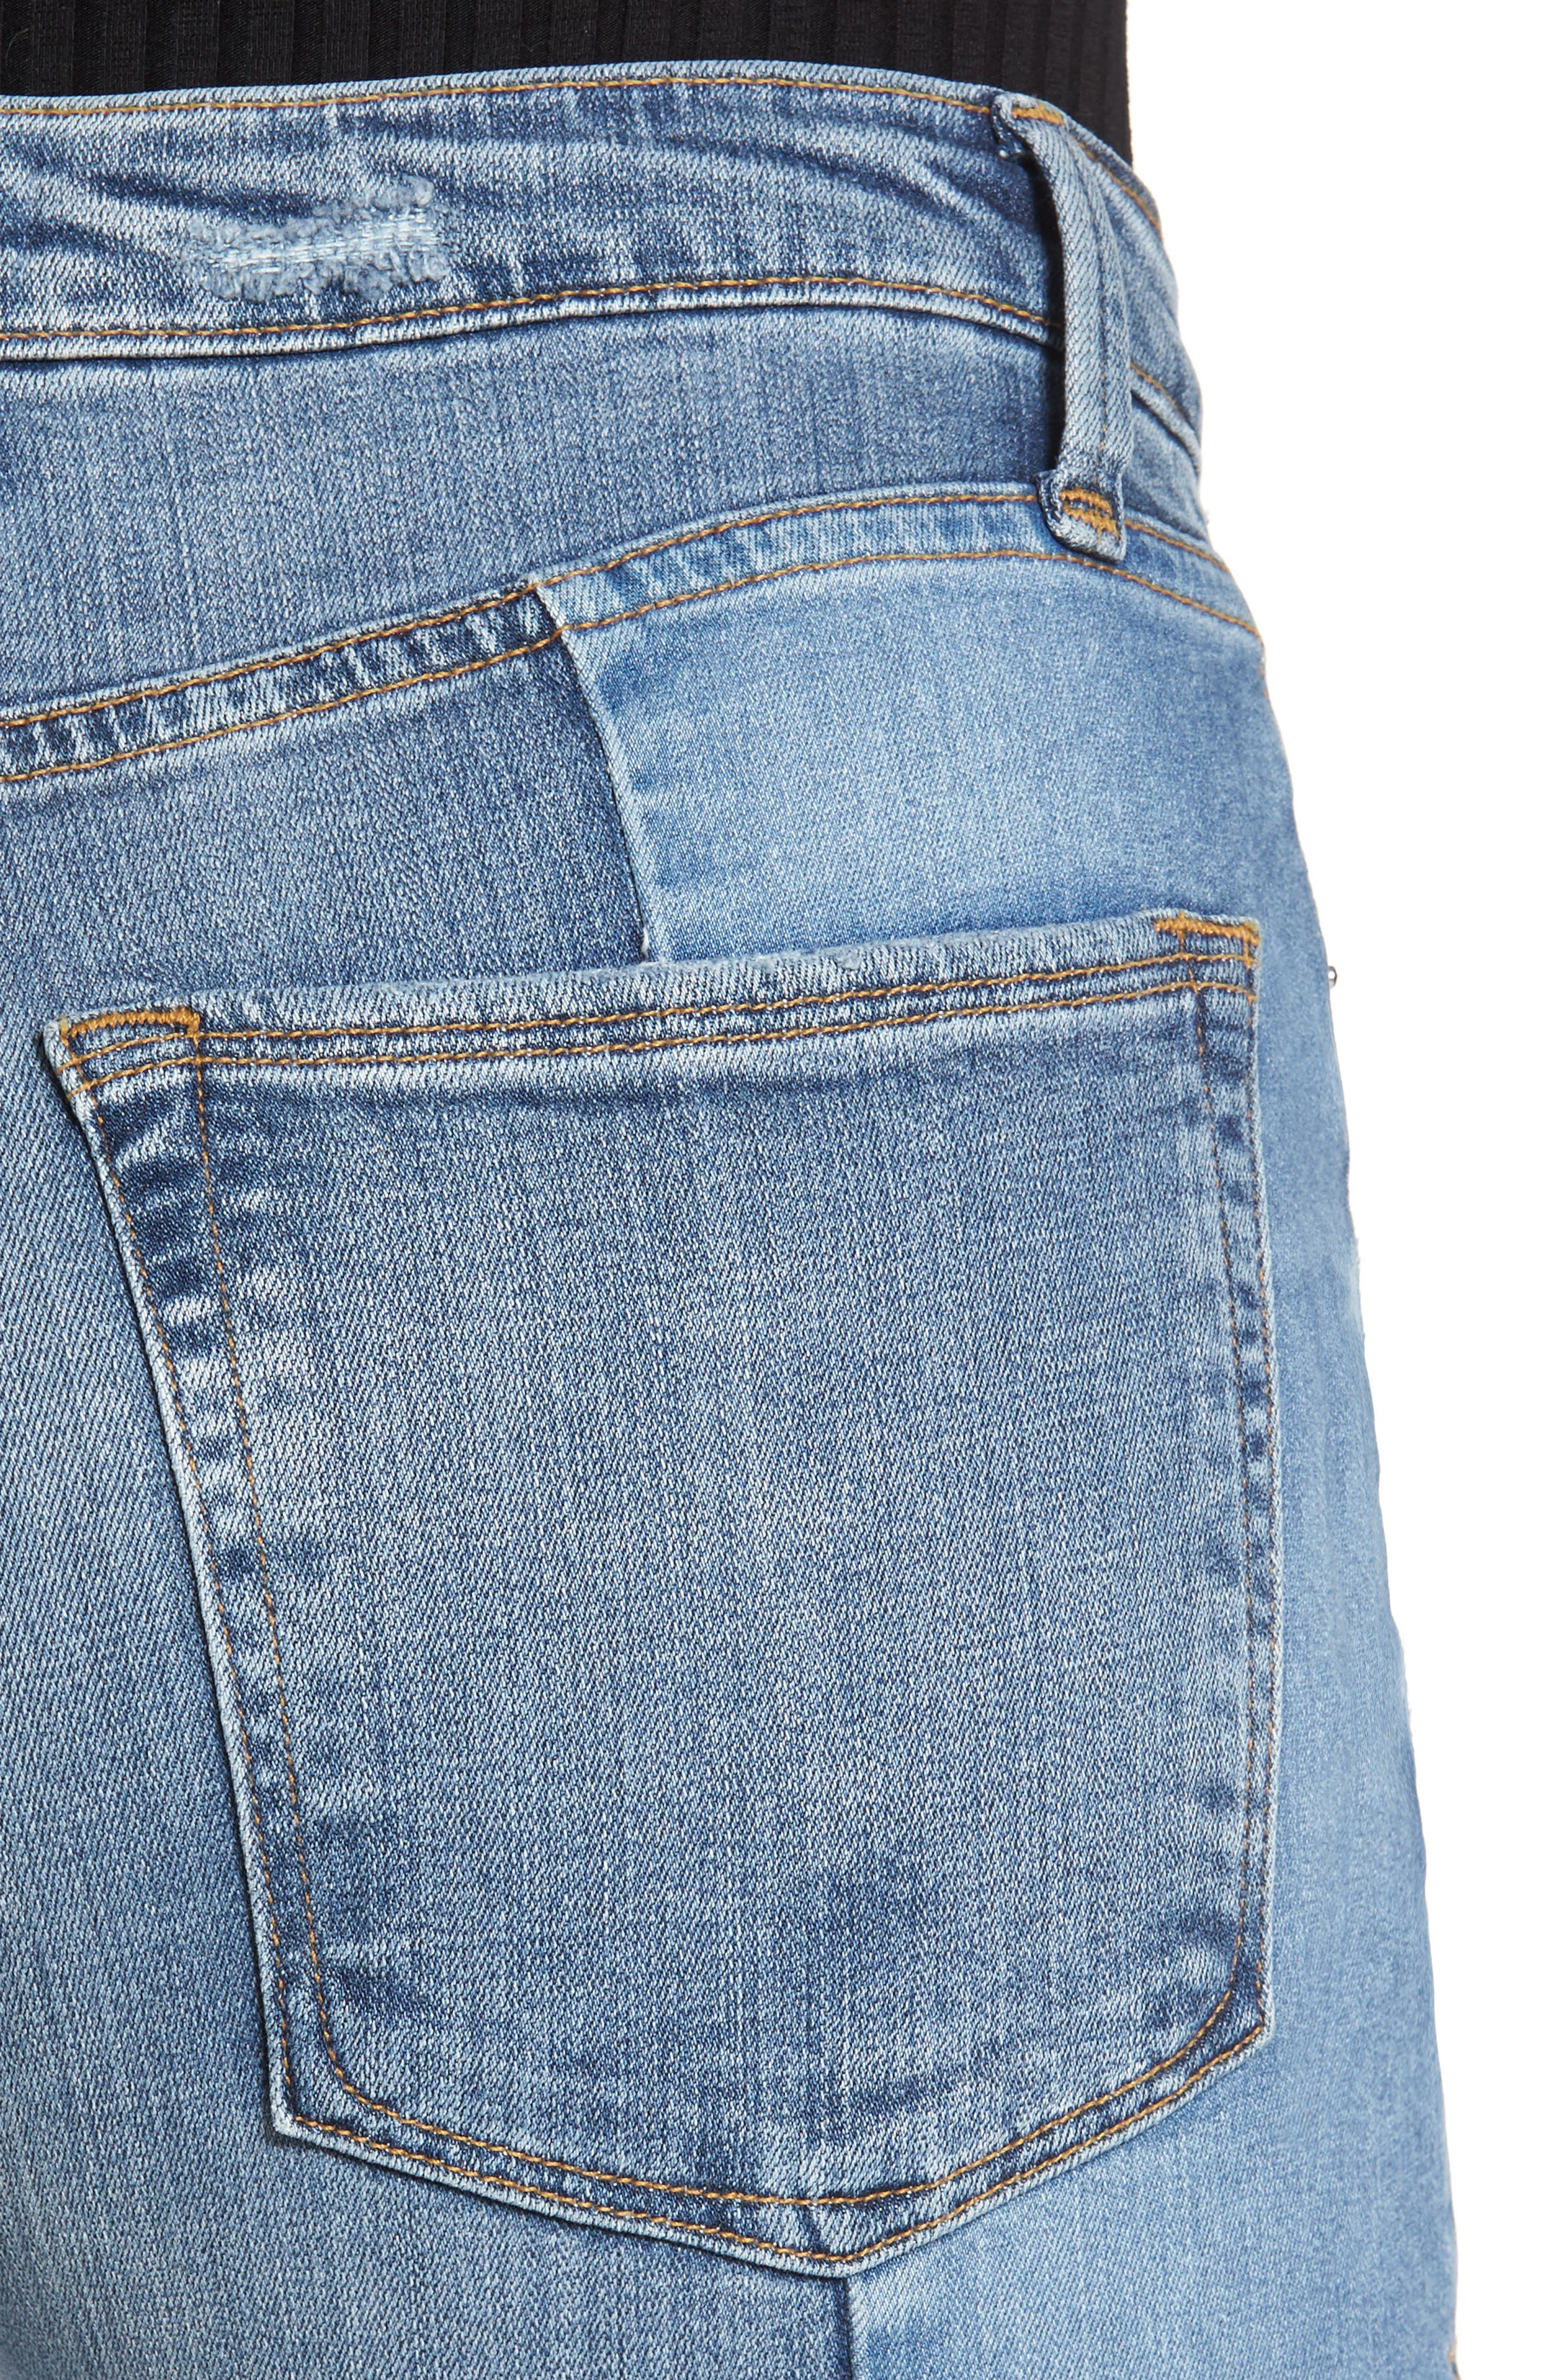 Raw Hem High Waist Skinny Jeans,                             Alternate thumbnail 4, color,                             Blue078